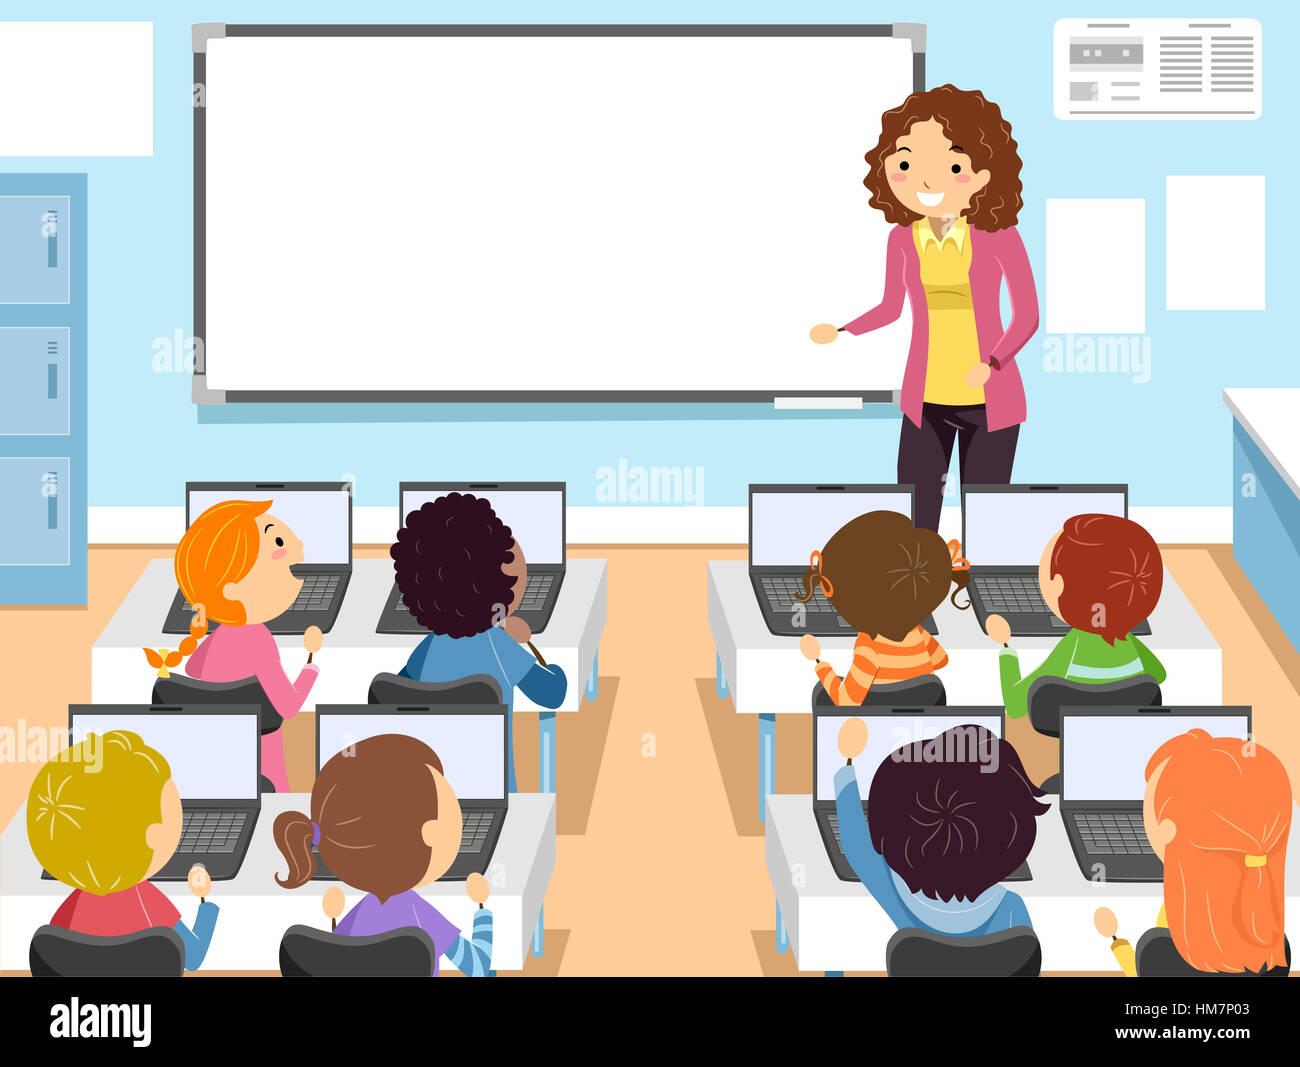 Stickman Illustration Of Preschool Children In A Computer Class Stock Photo